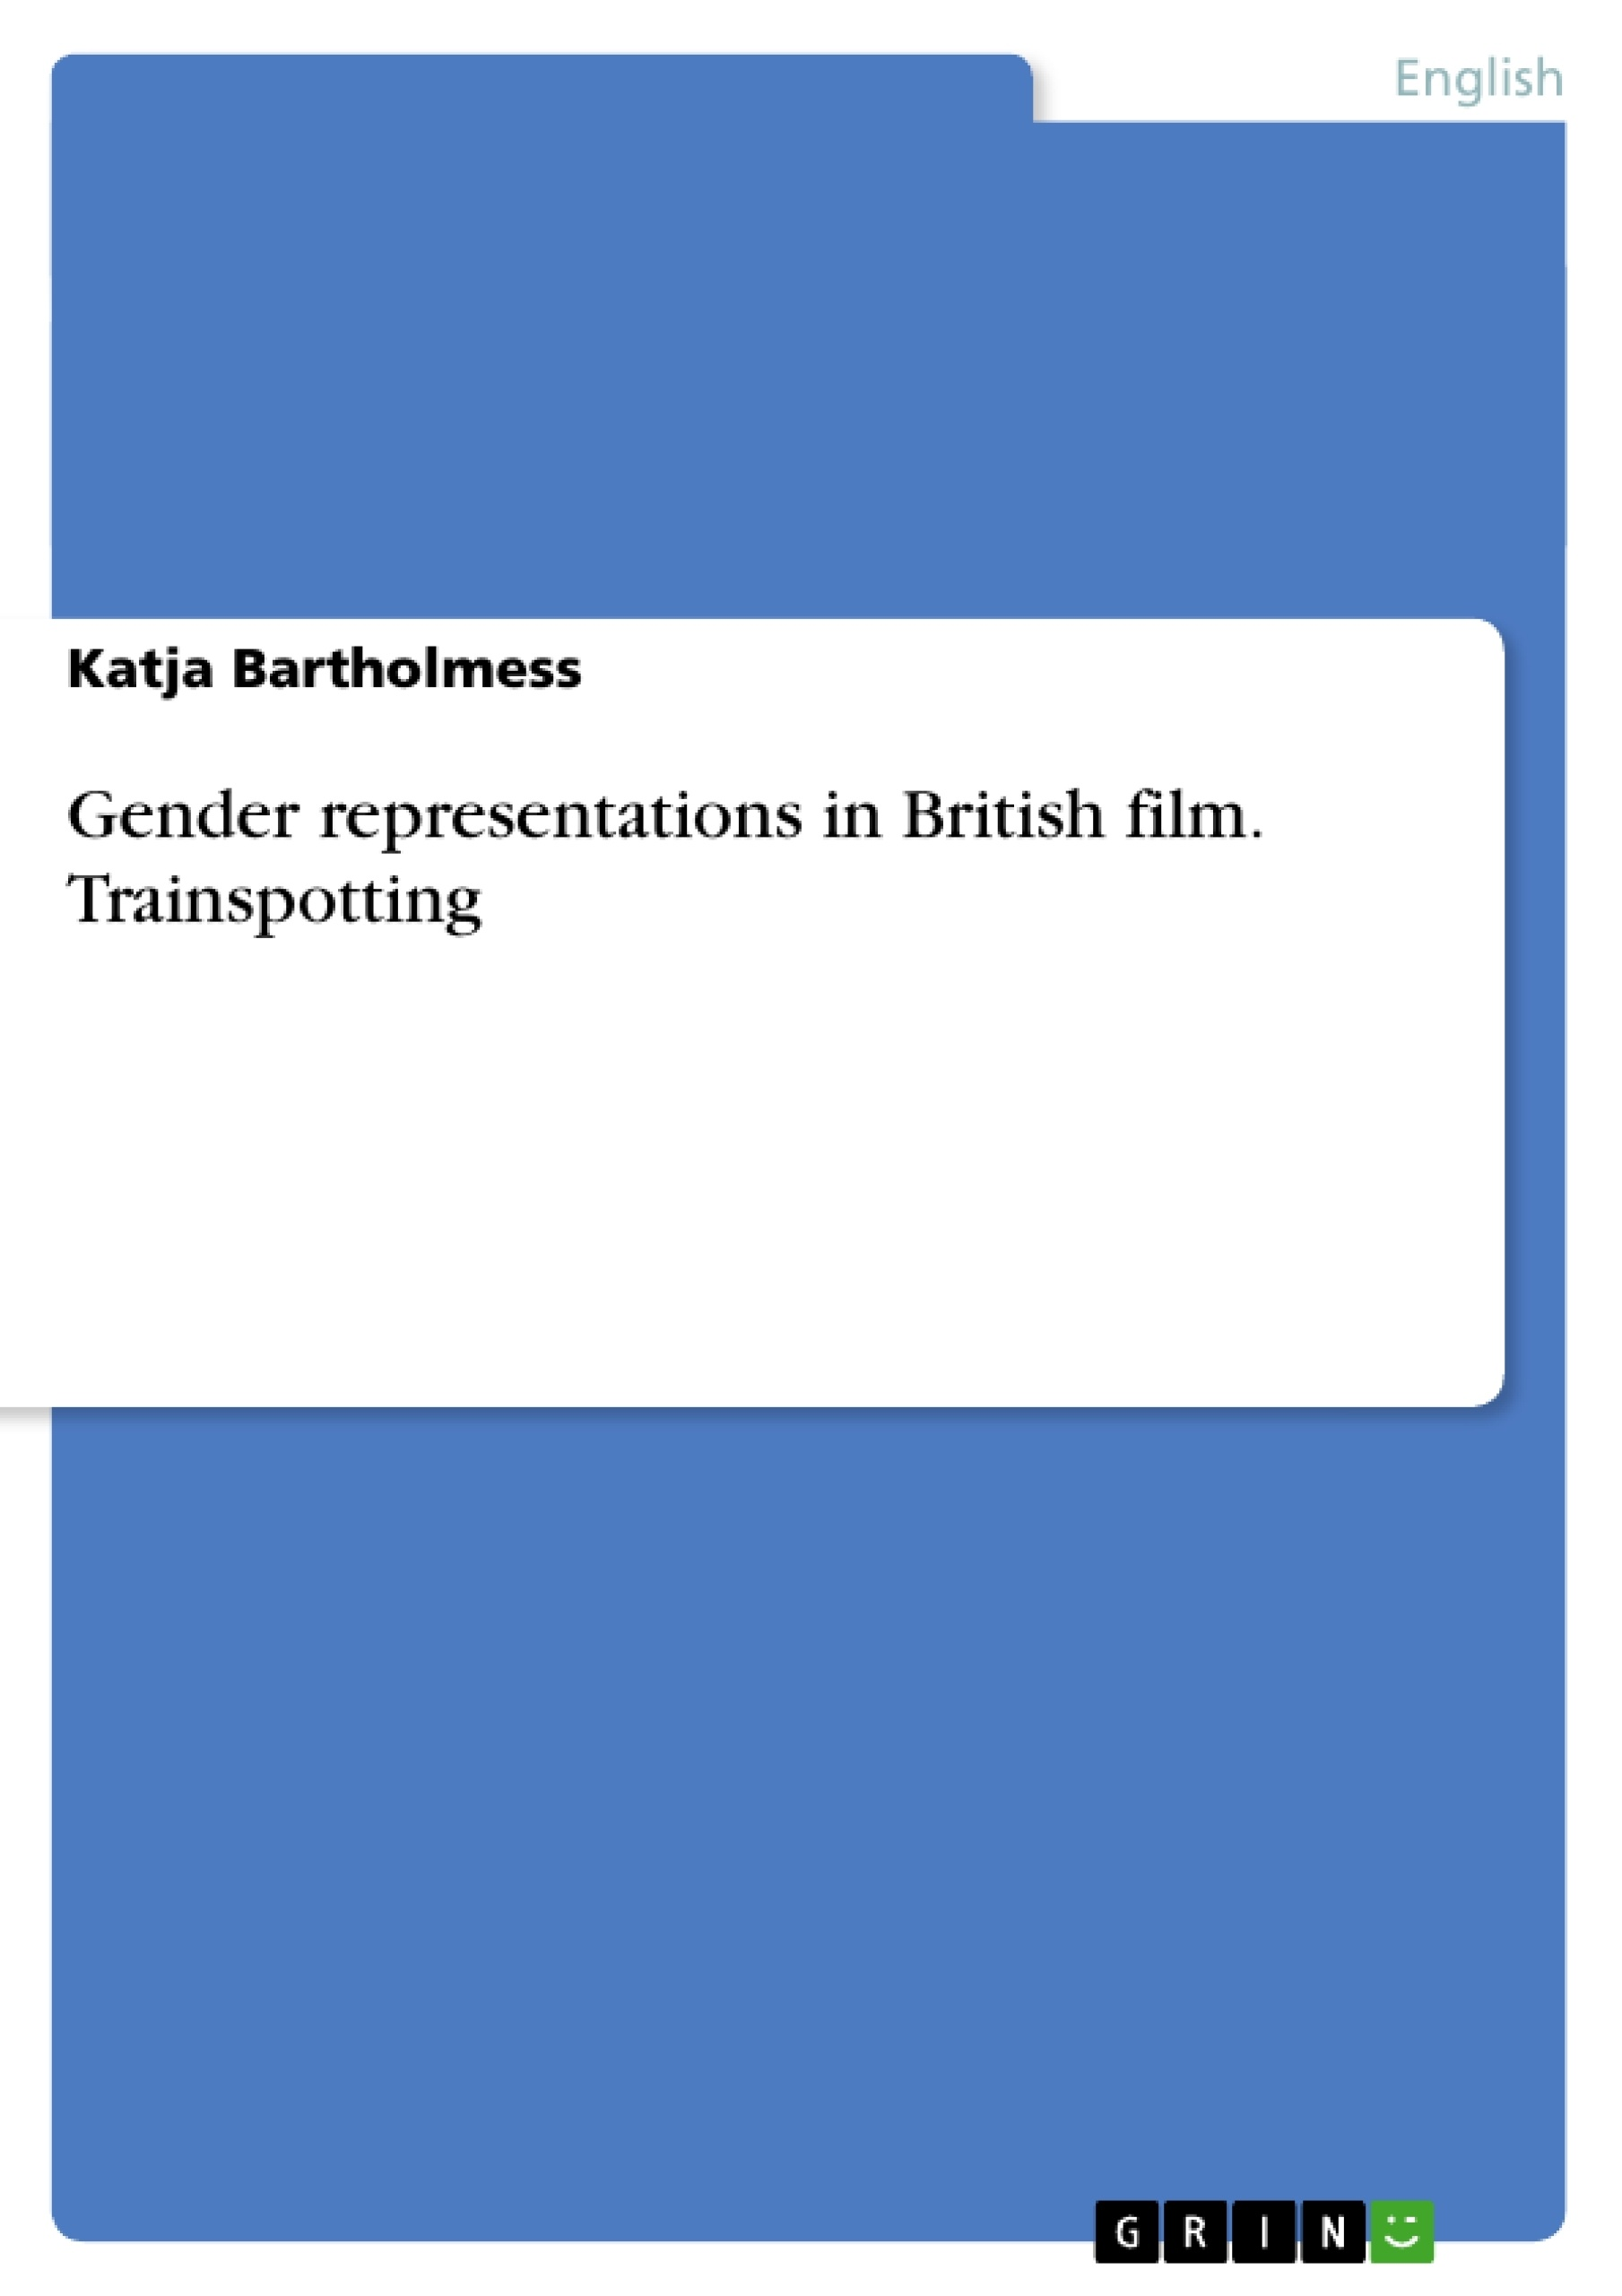 Title: Gender representations in British film. Trainspotting